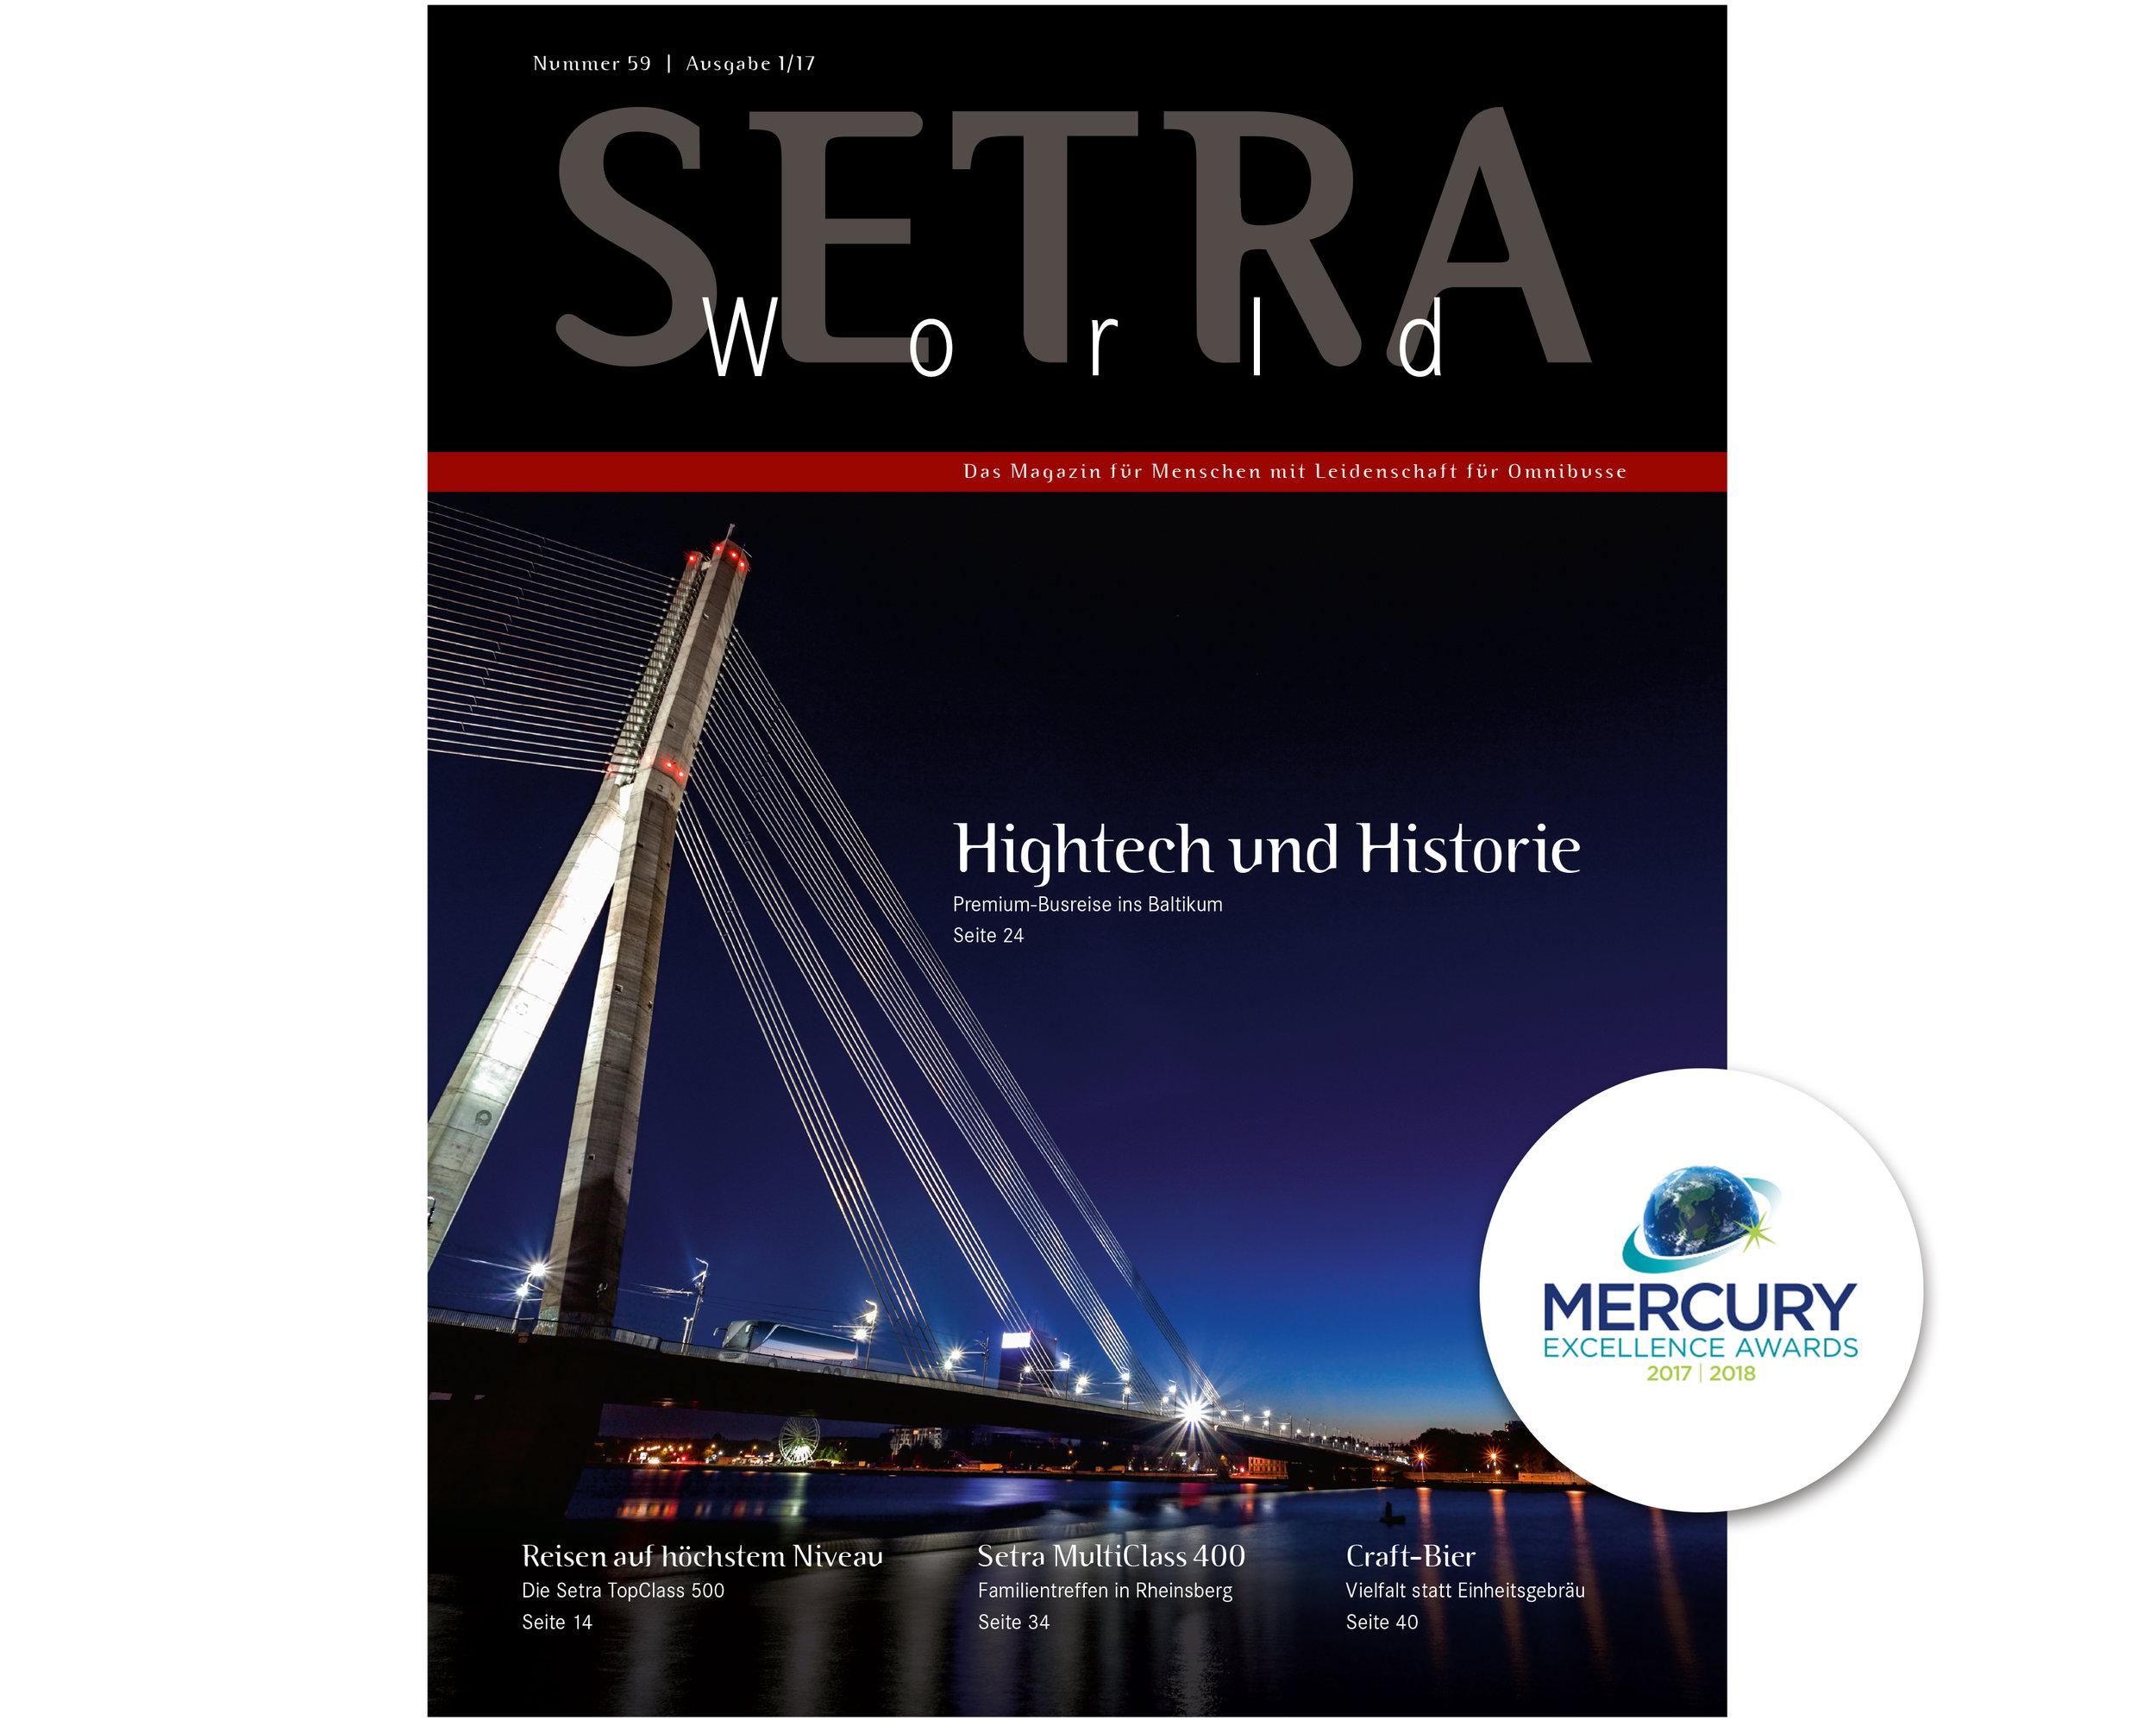 Setra_World_cover_09.jpg